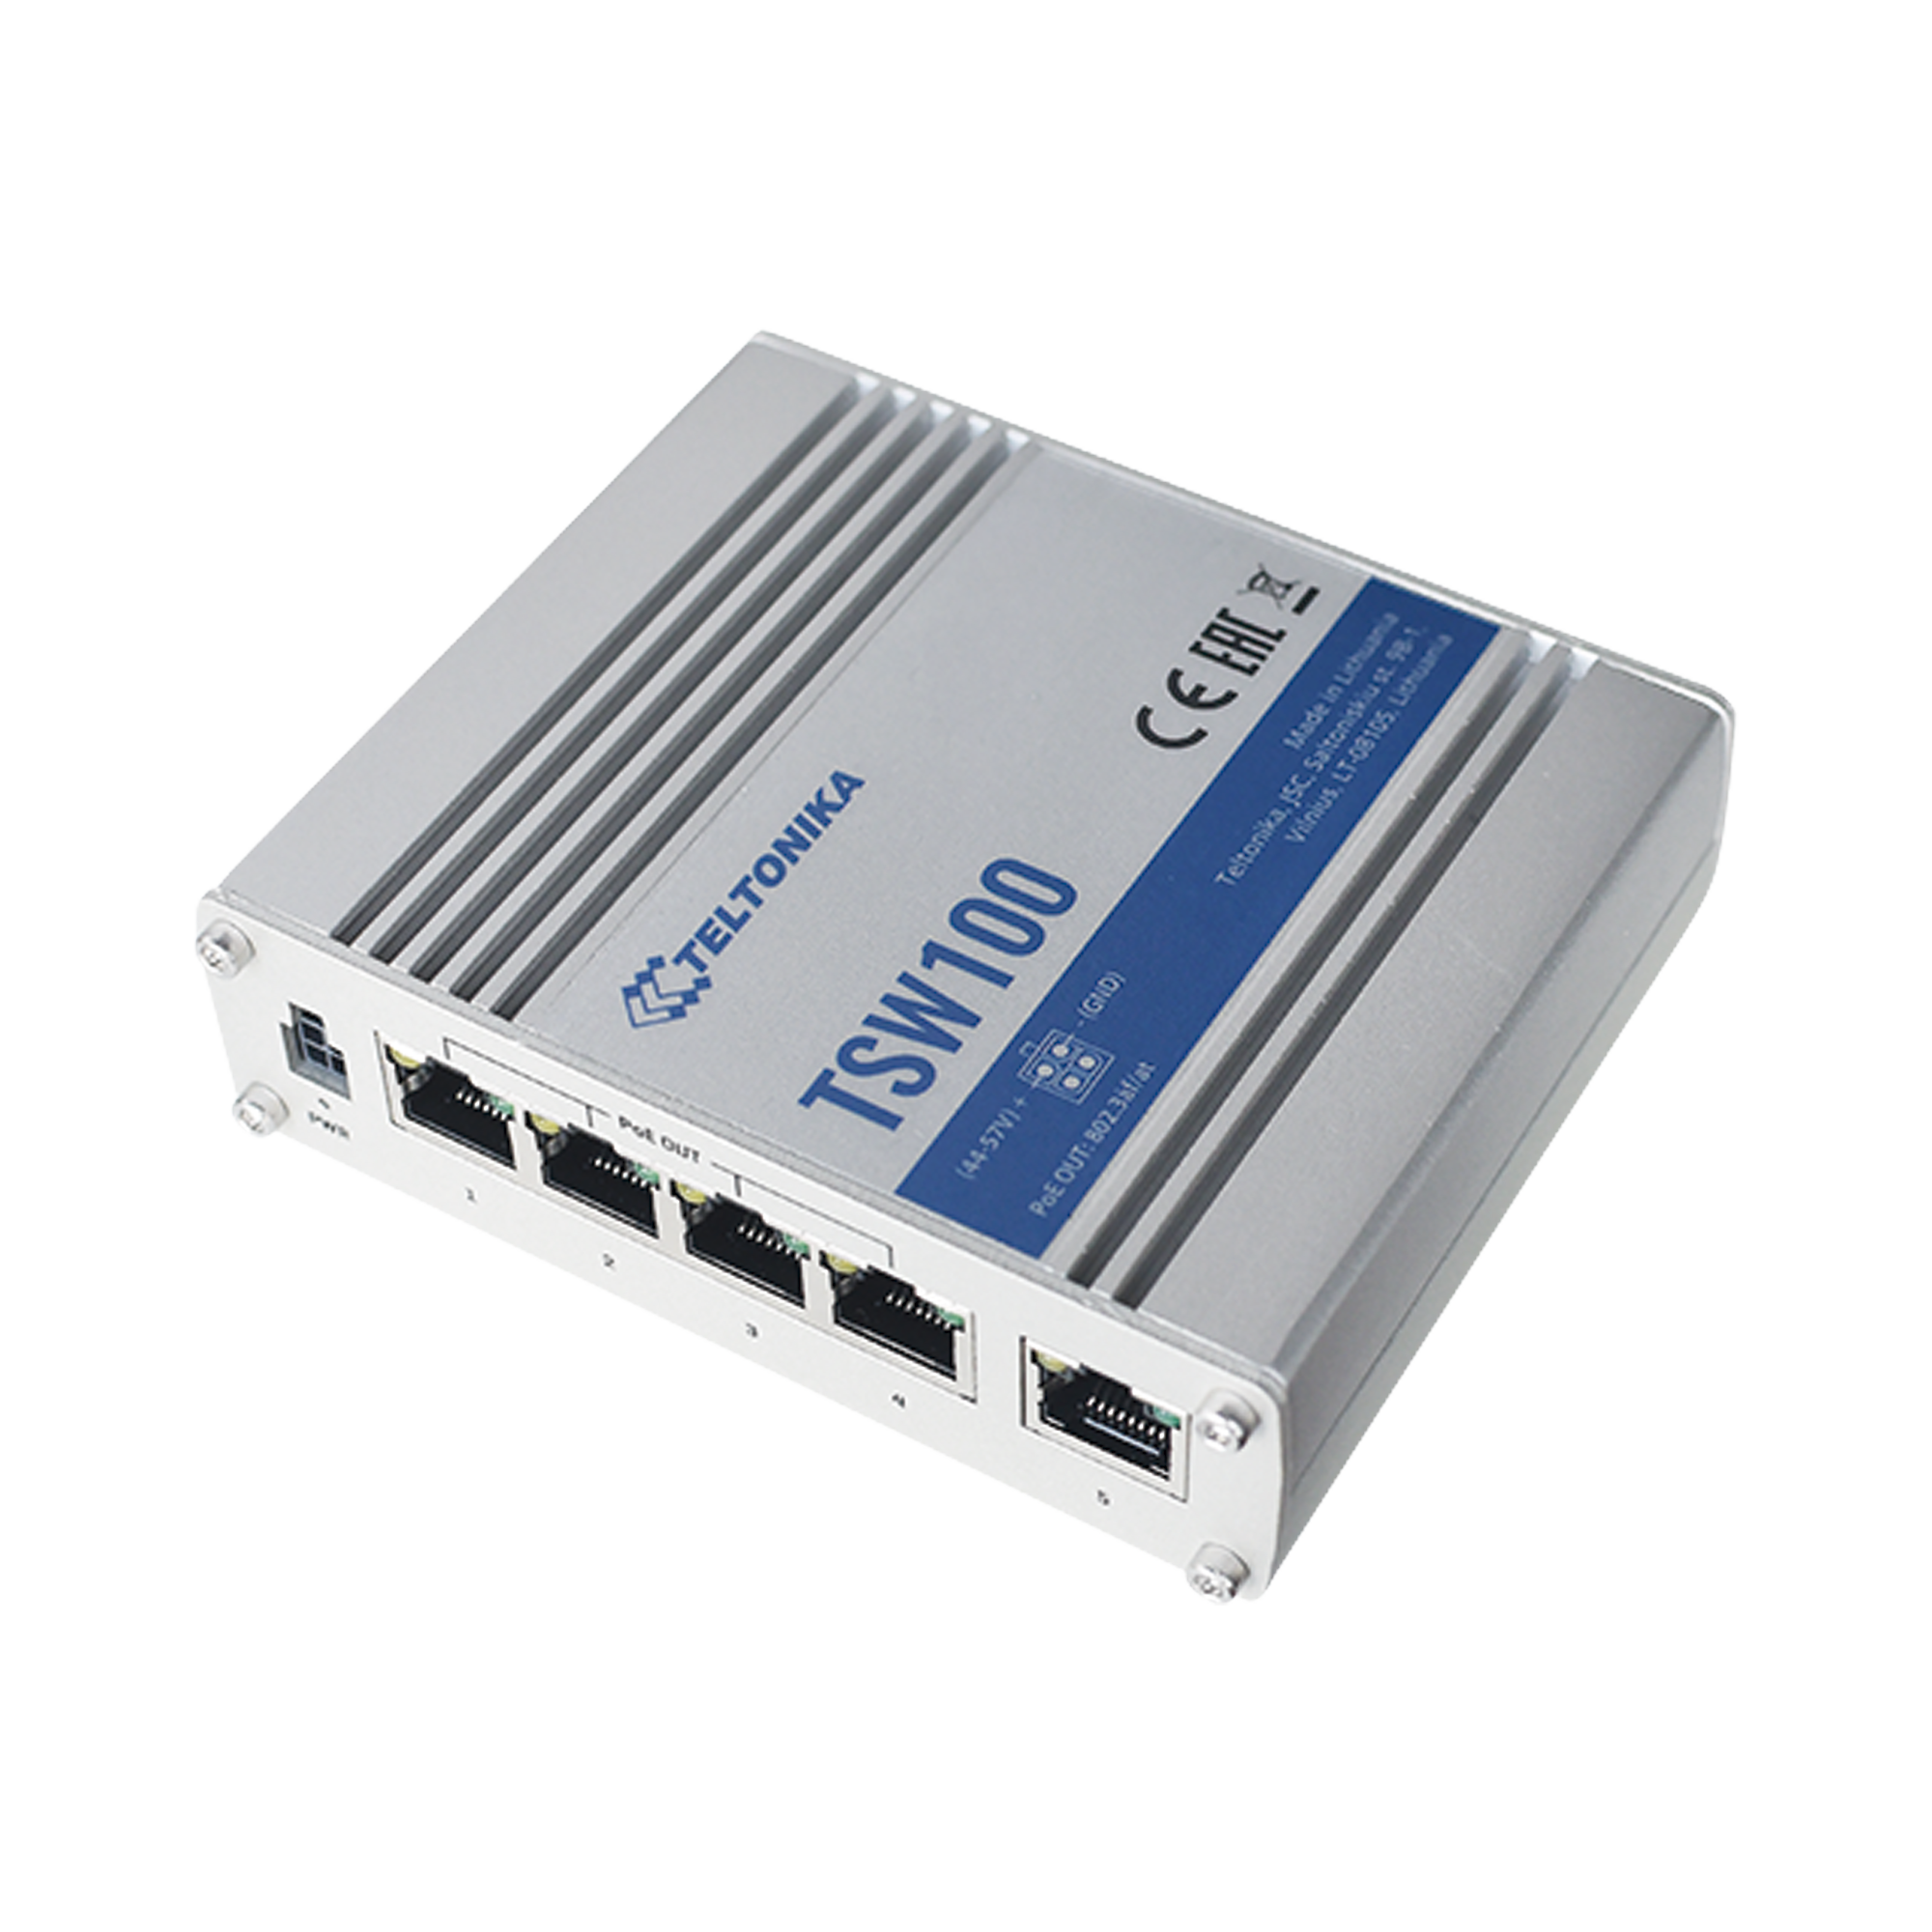 Switch Industrial No-Administrable 5 puertos Gigabit, PoE en 4 puertos 802.3af/at (120W)